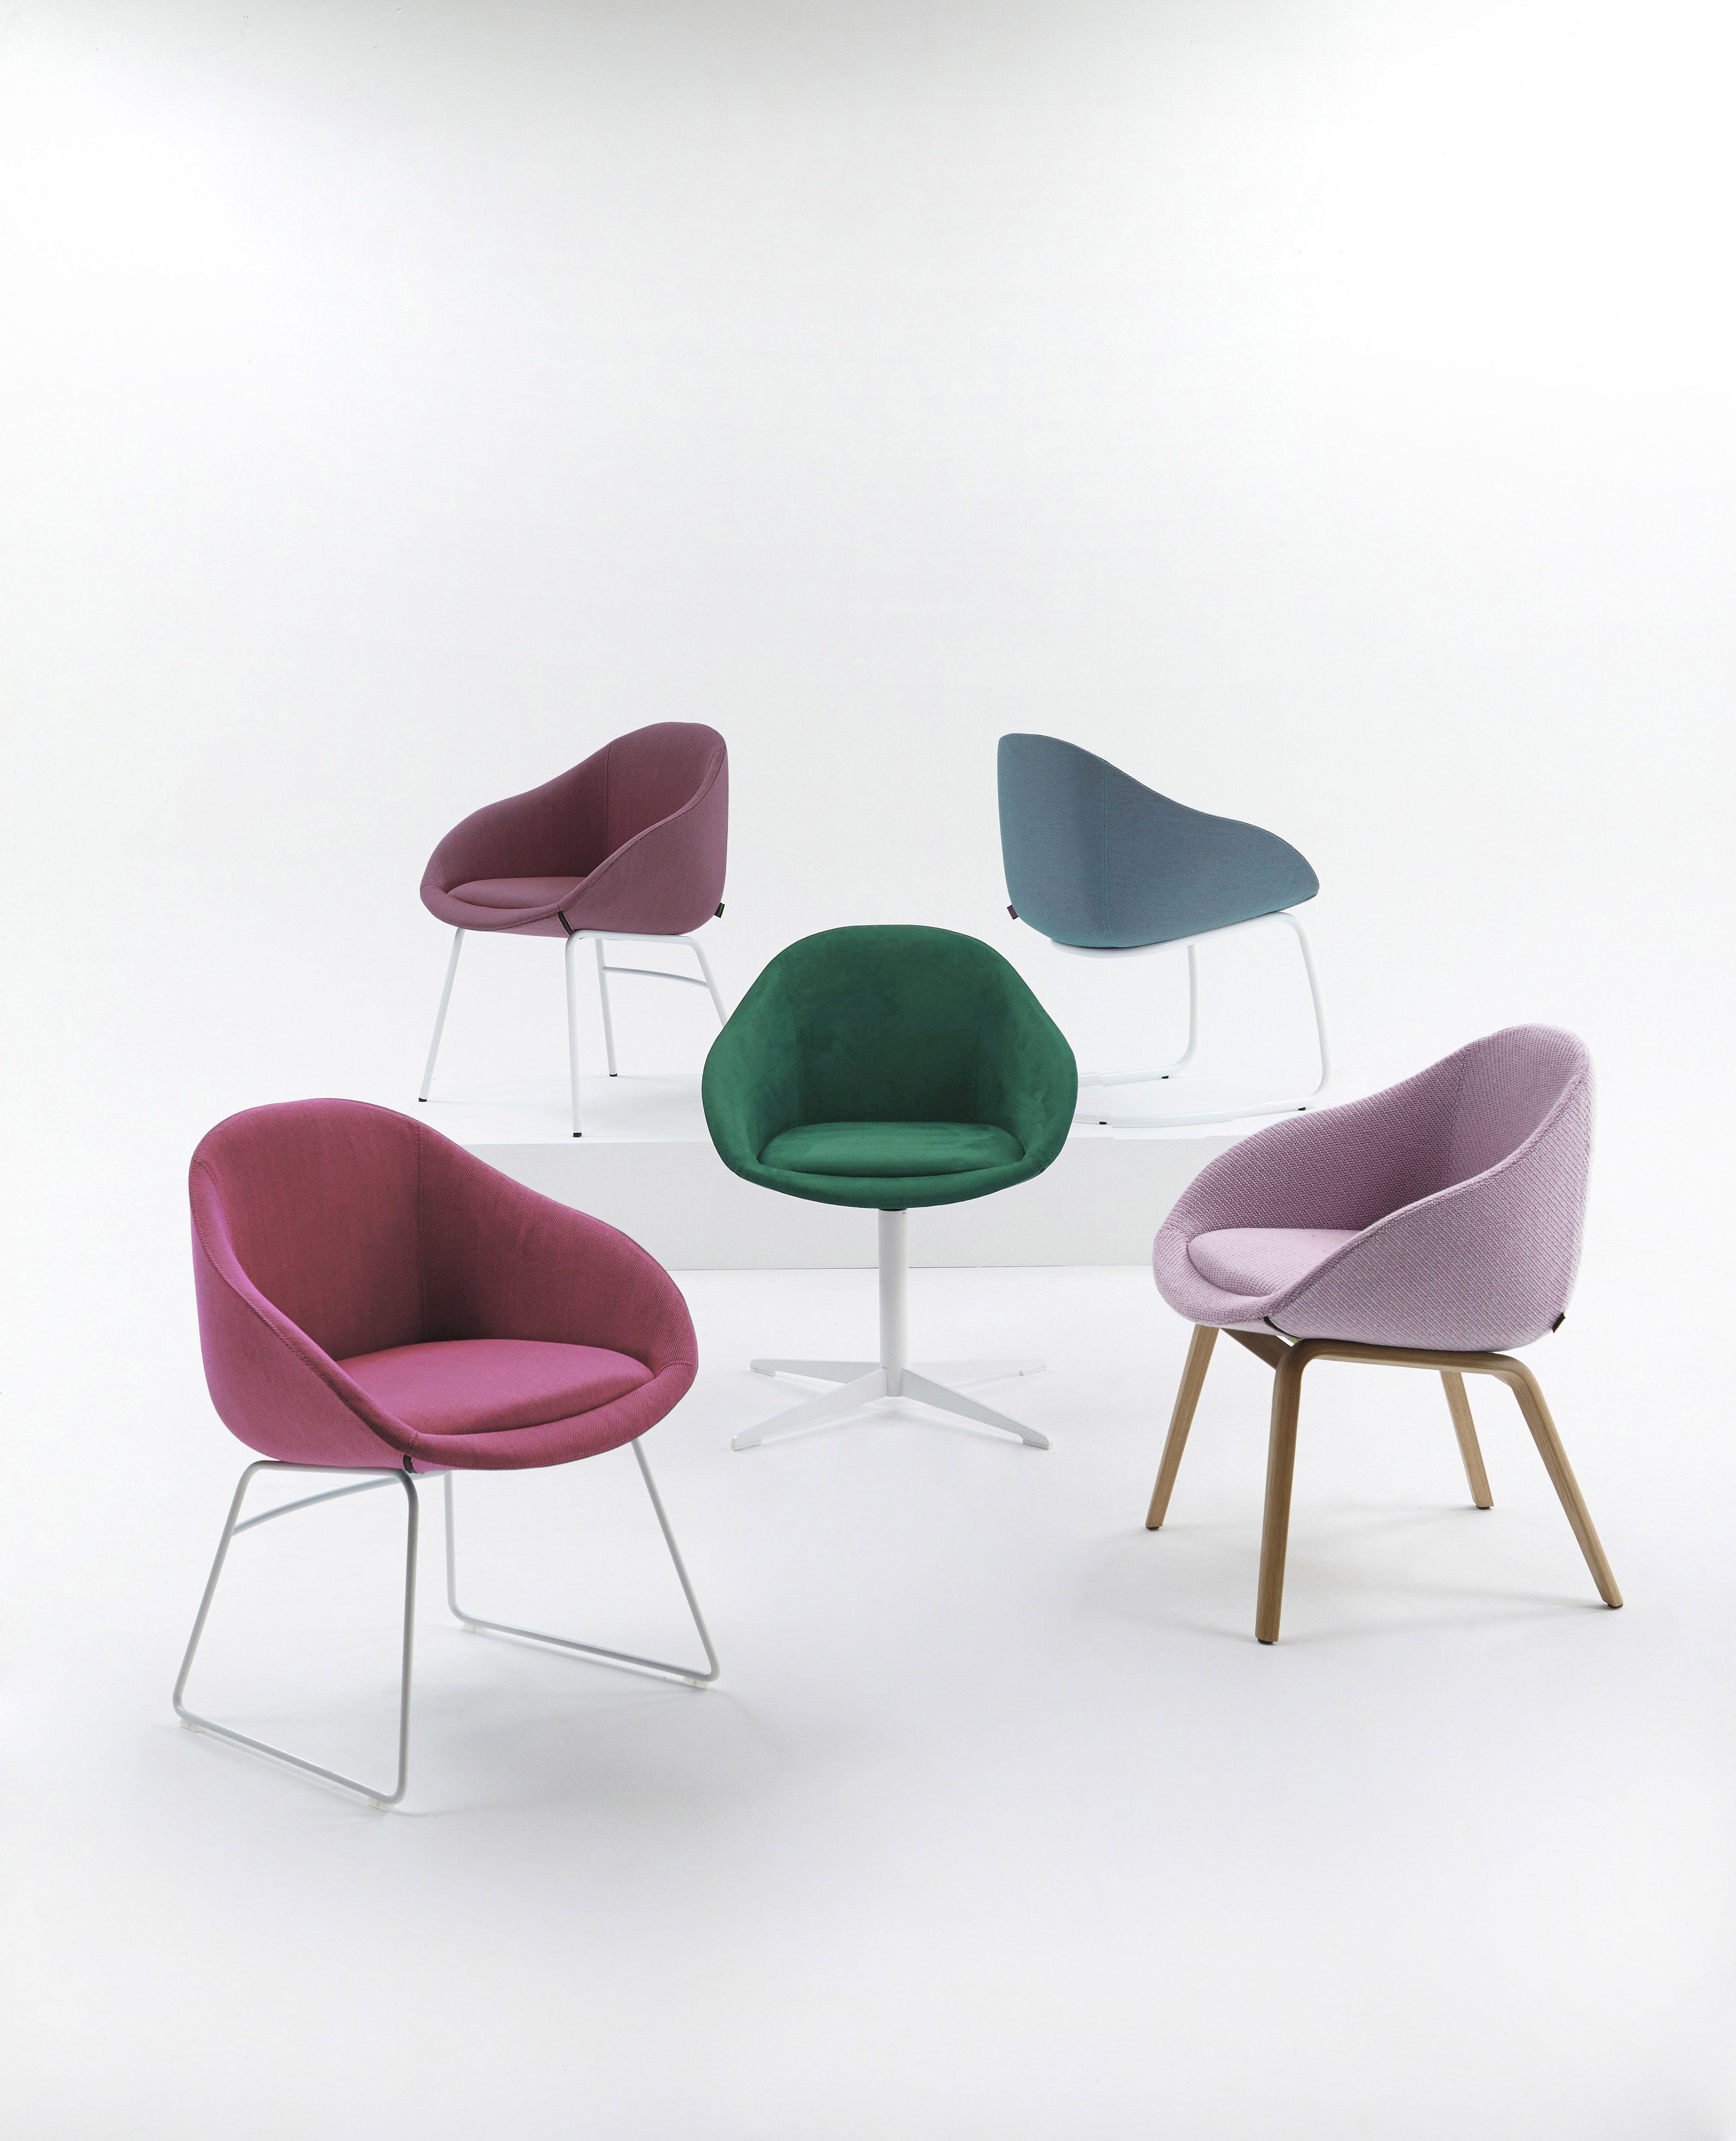 naughtone always chairs in pastel tones contemporary beautiful  - naughtone always chairs in pastel tones contemporary beautiful furniture